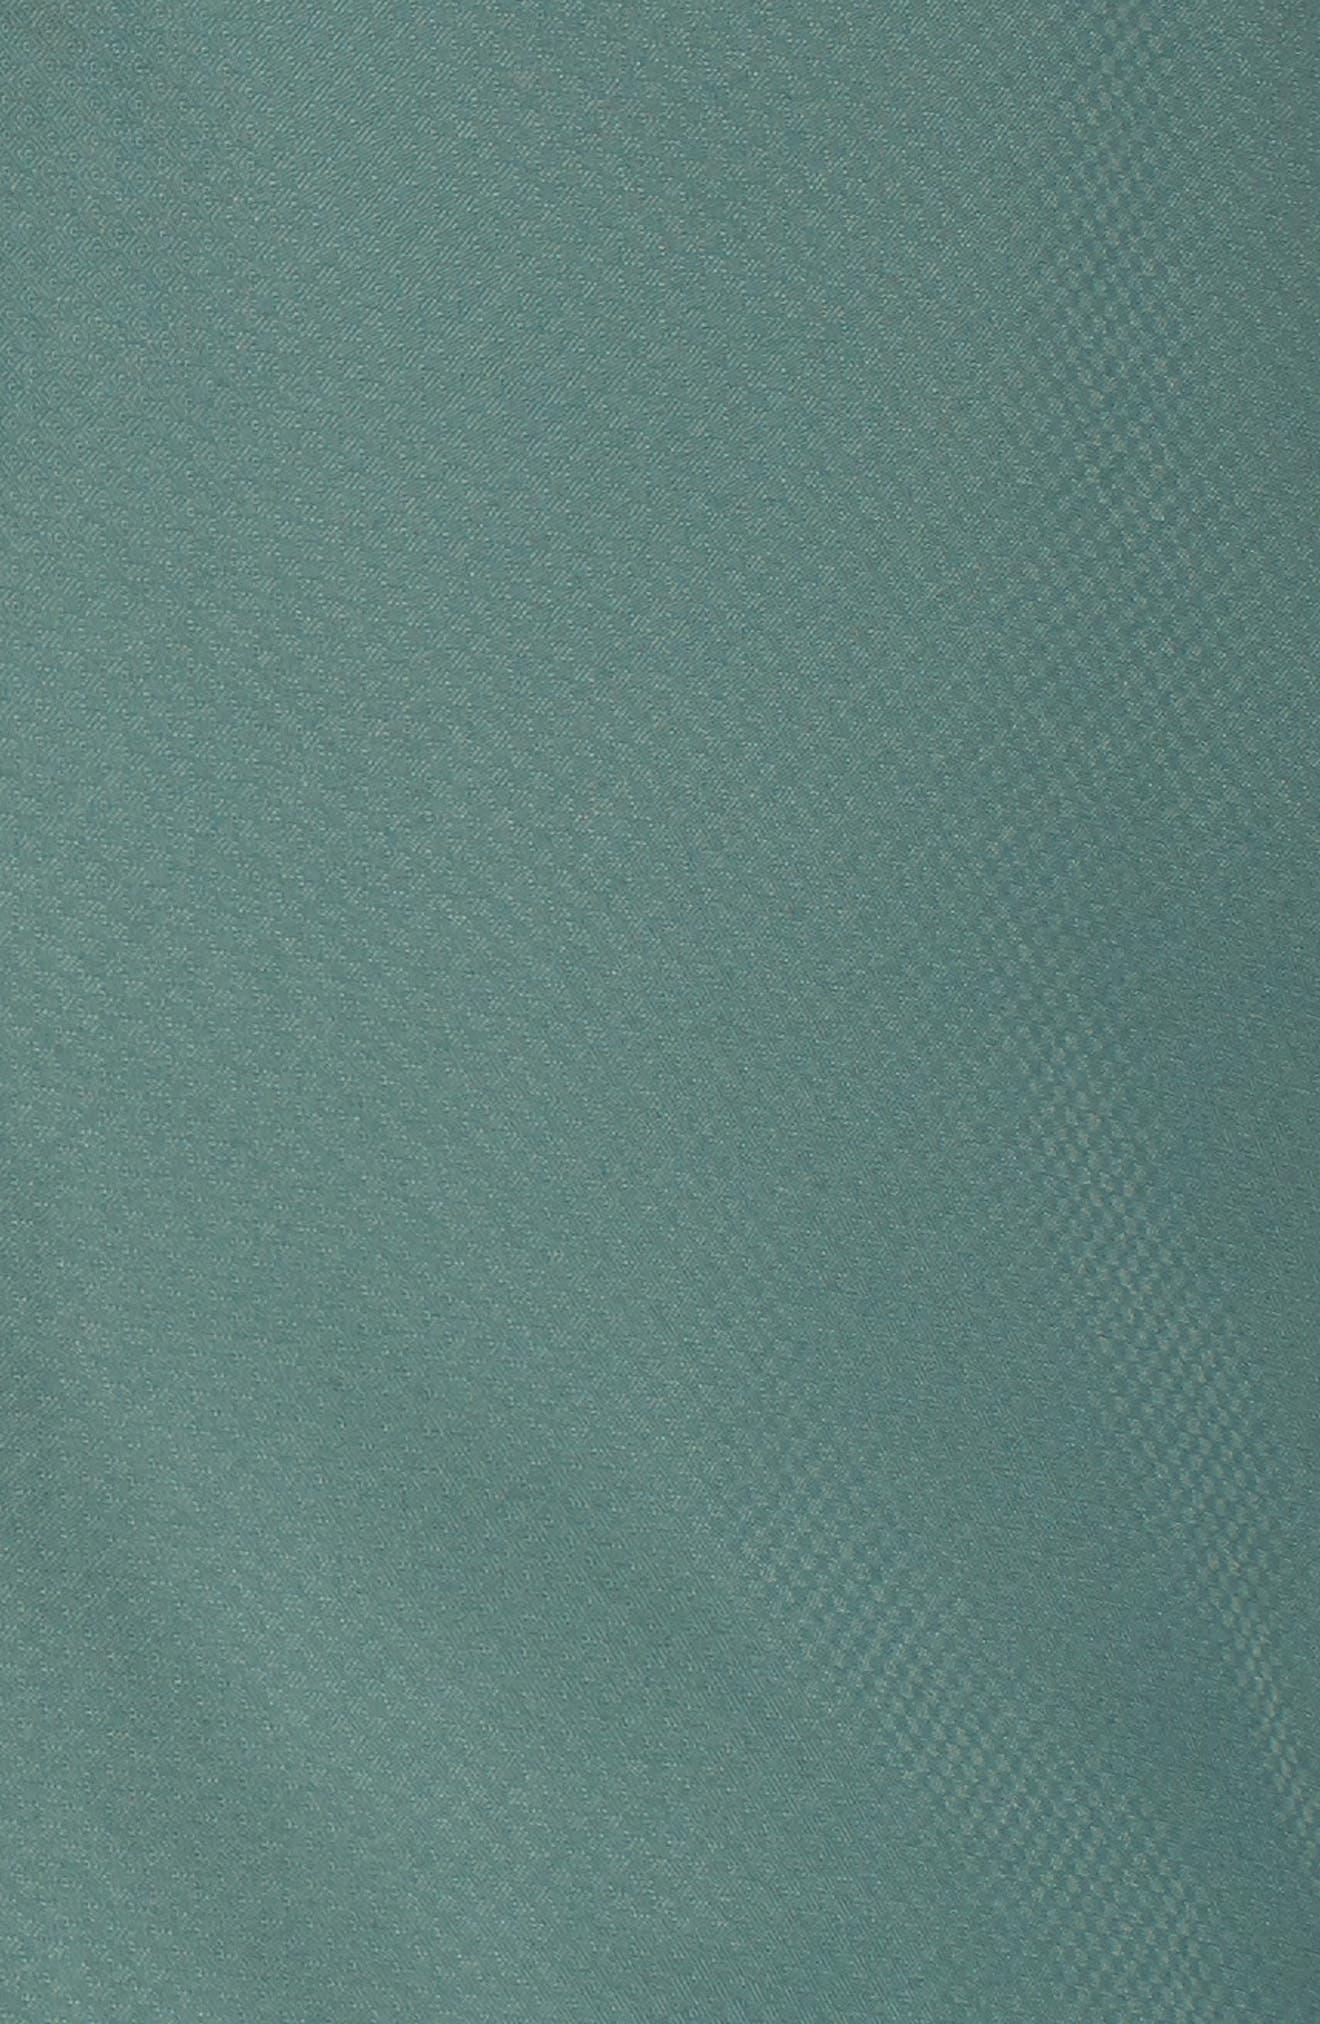 Mountain View Windbreaker Jacket,                             Alternate thumbnail 6, color,                             Pesto